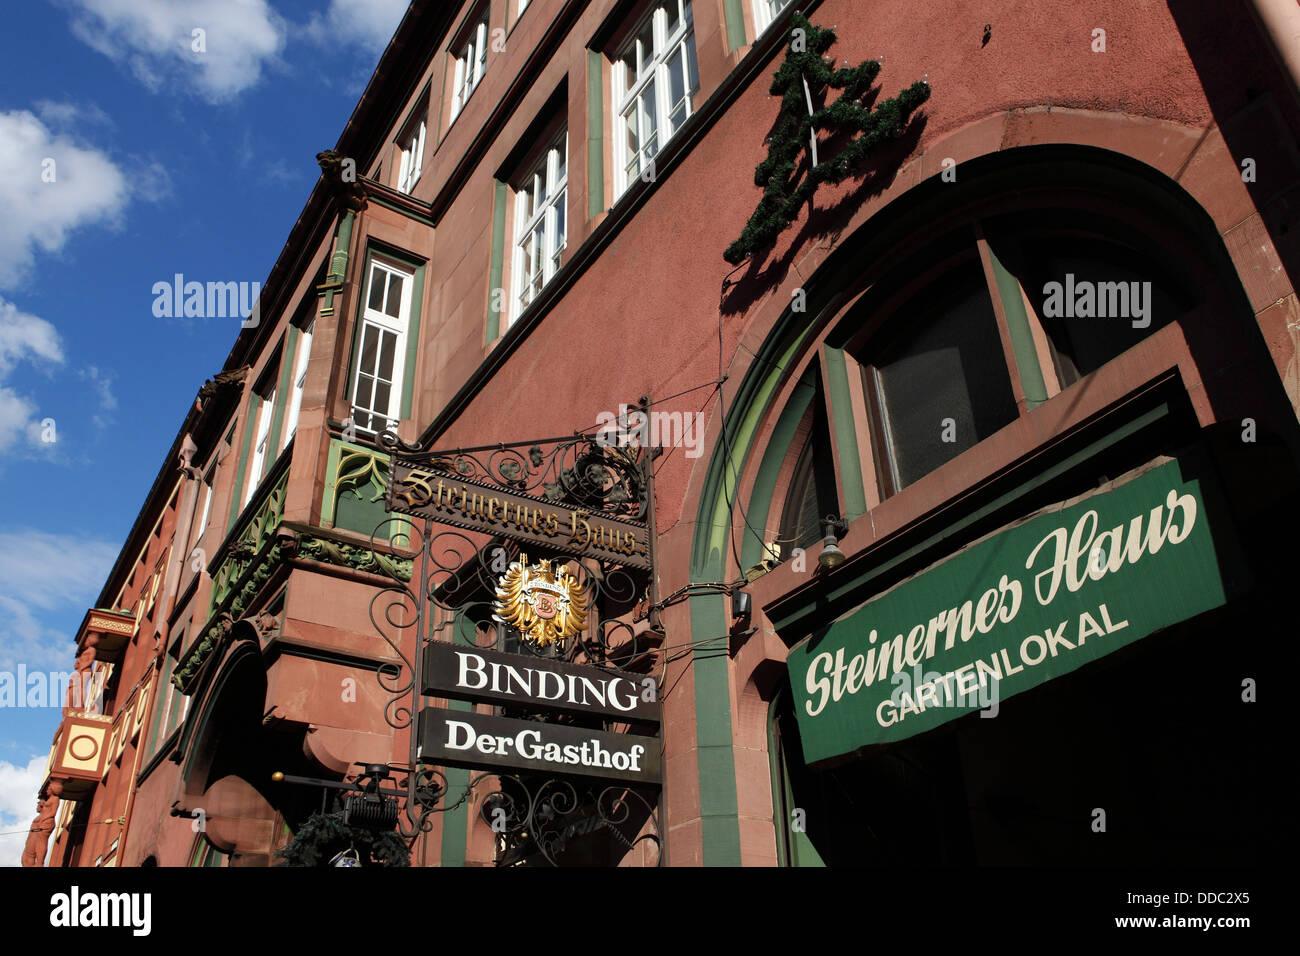 The Bier Garden German Stock Photos & The Bier Garden German Stock ...